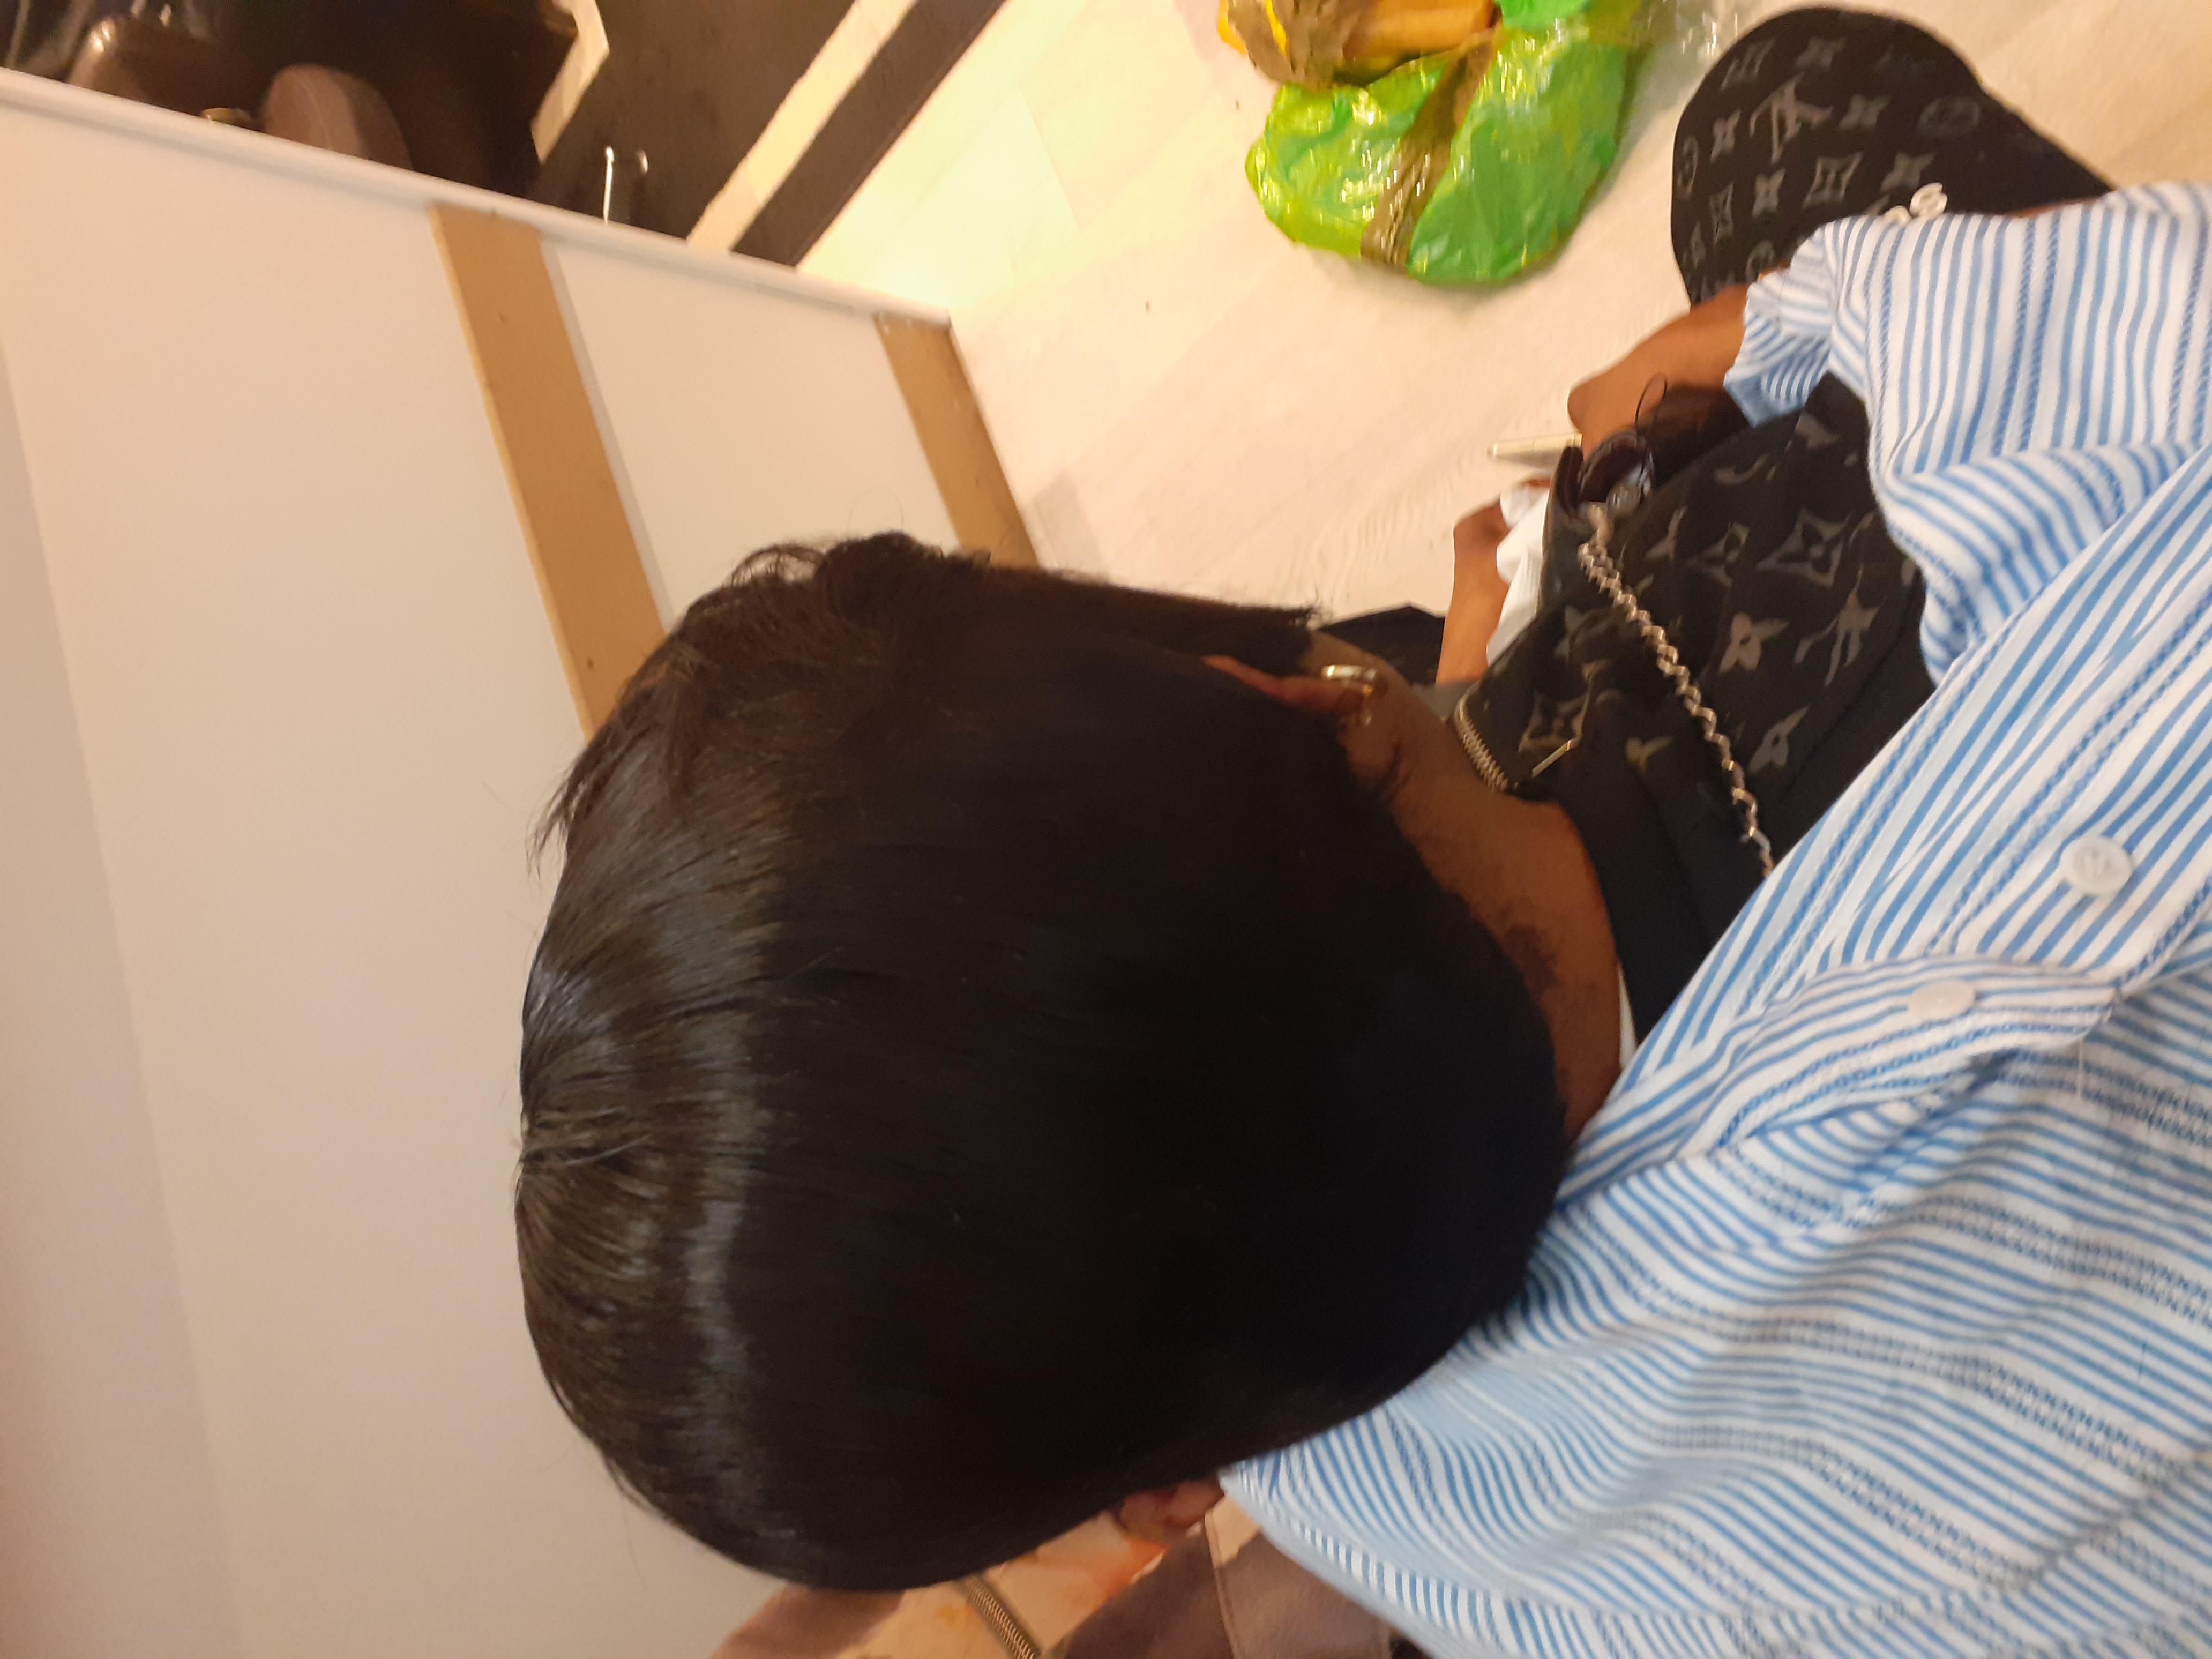 salon de coiffure afro tresse tresses box braids crochet braids vanilles tissages paris 75 77 78 91 92 93 94 95 PQOQPBSN